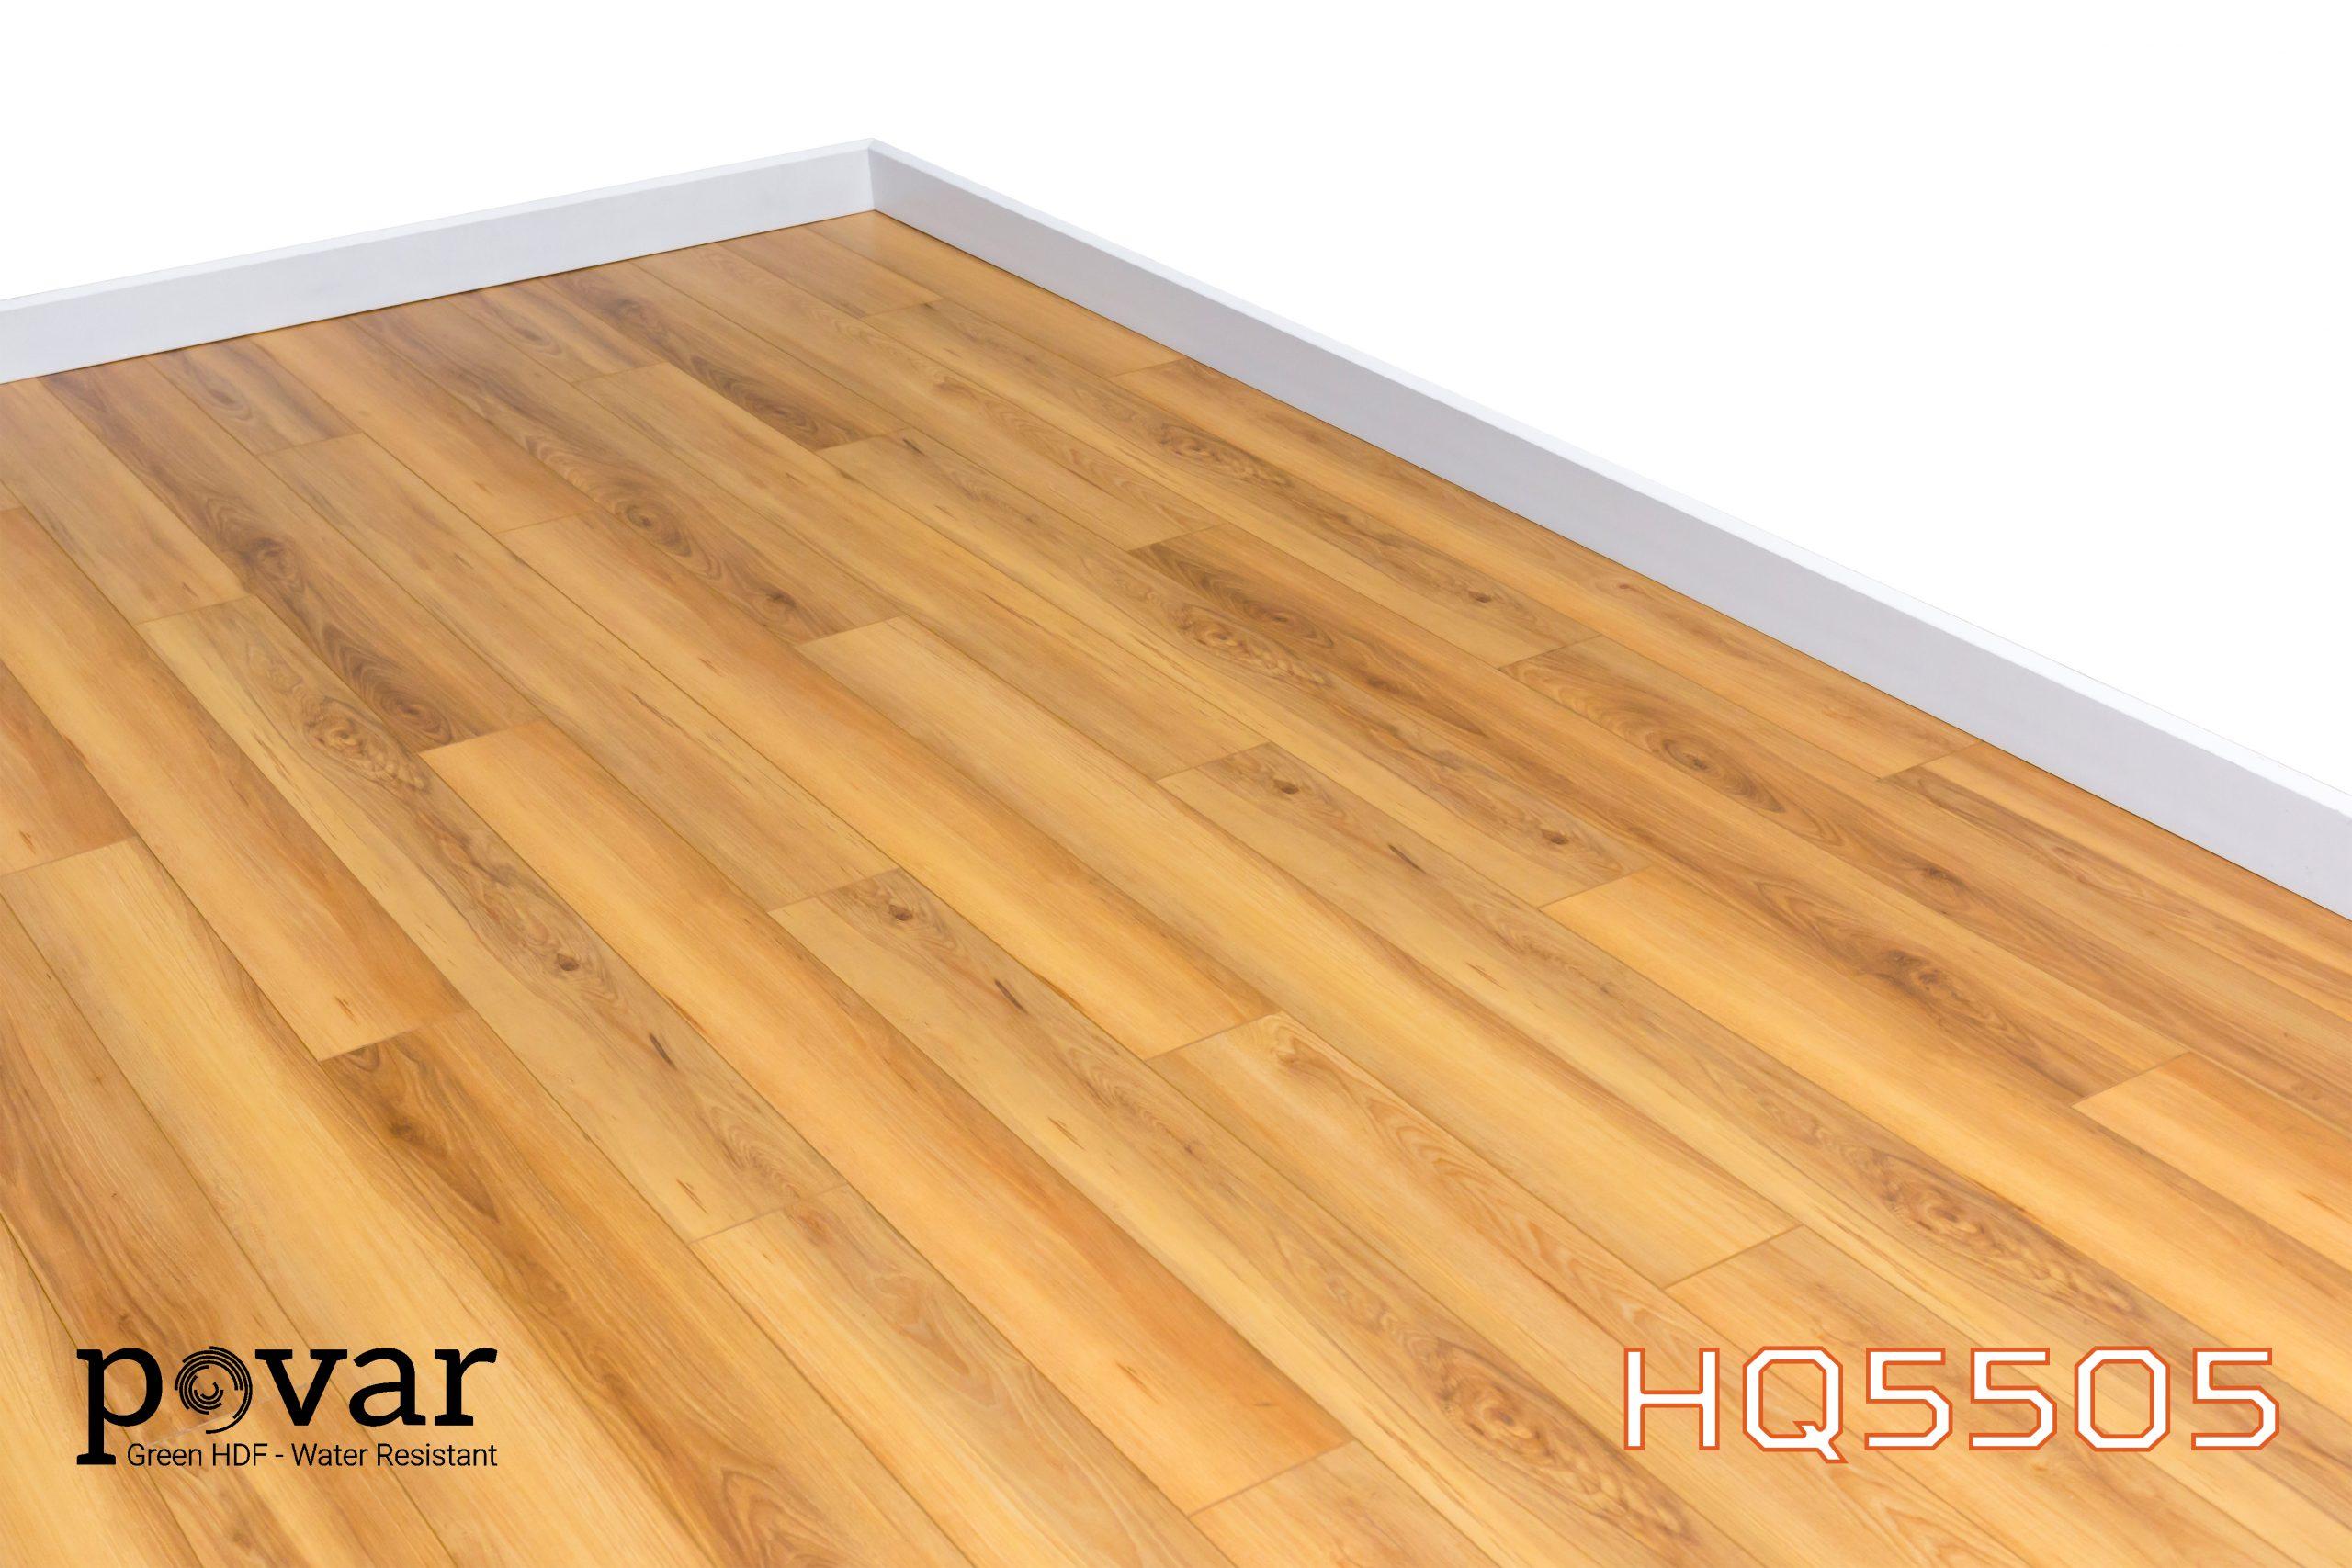 Sàn gỗ Povar HQ5505